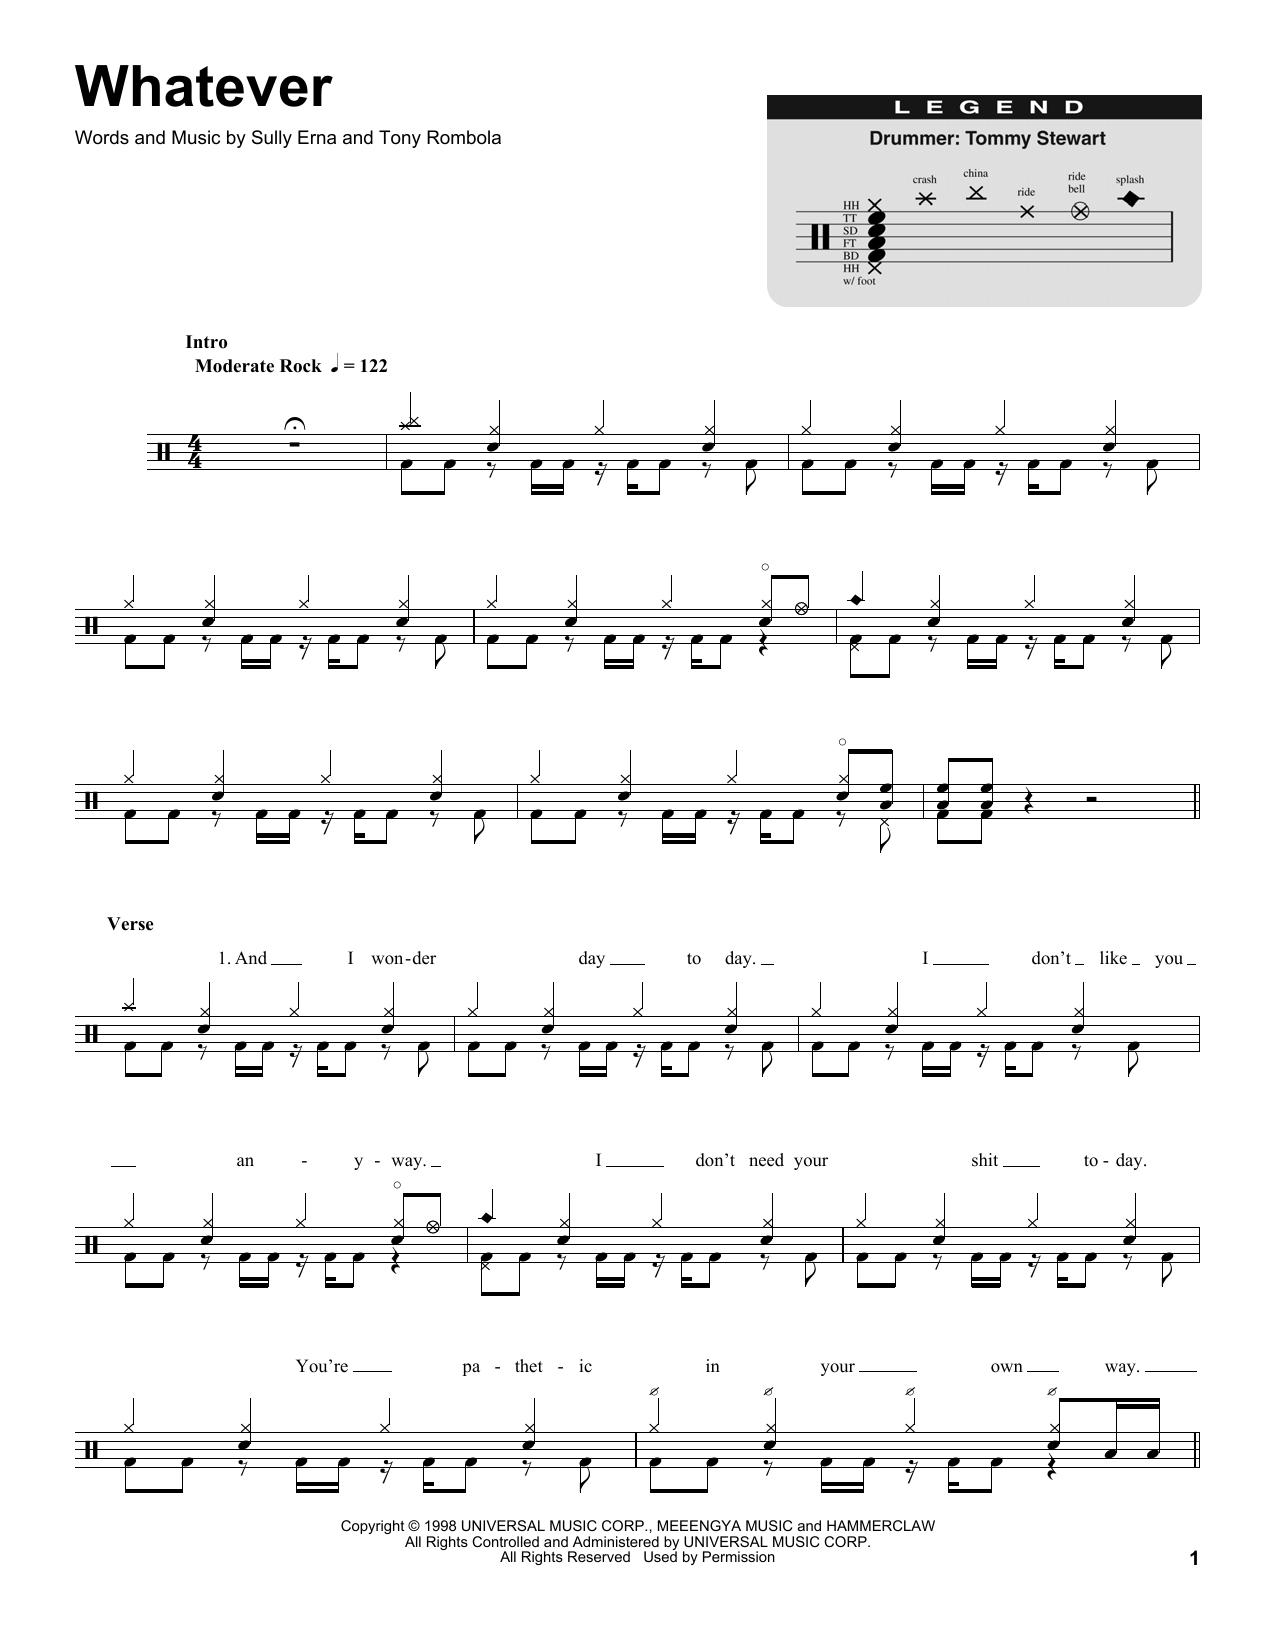 Godsmack Whatever Sheet Music Notes Chords Printable Pop Drums